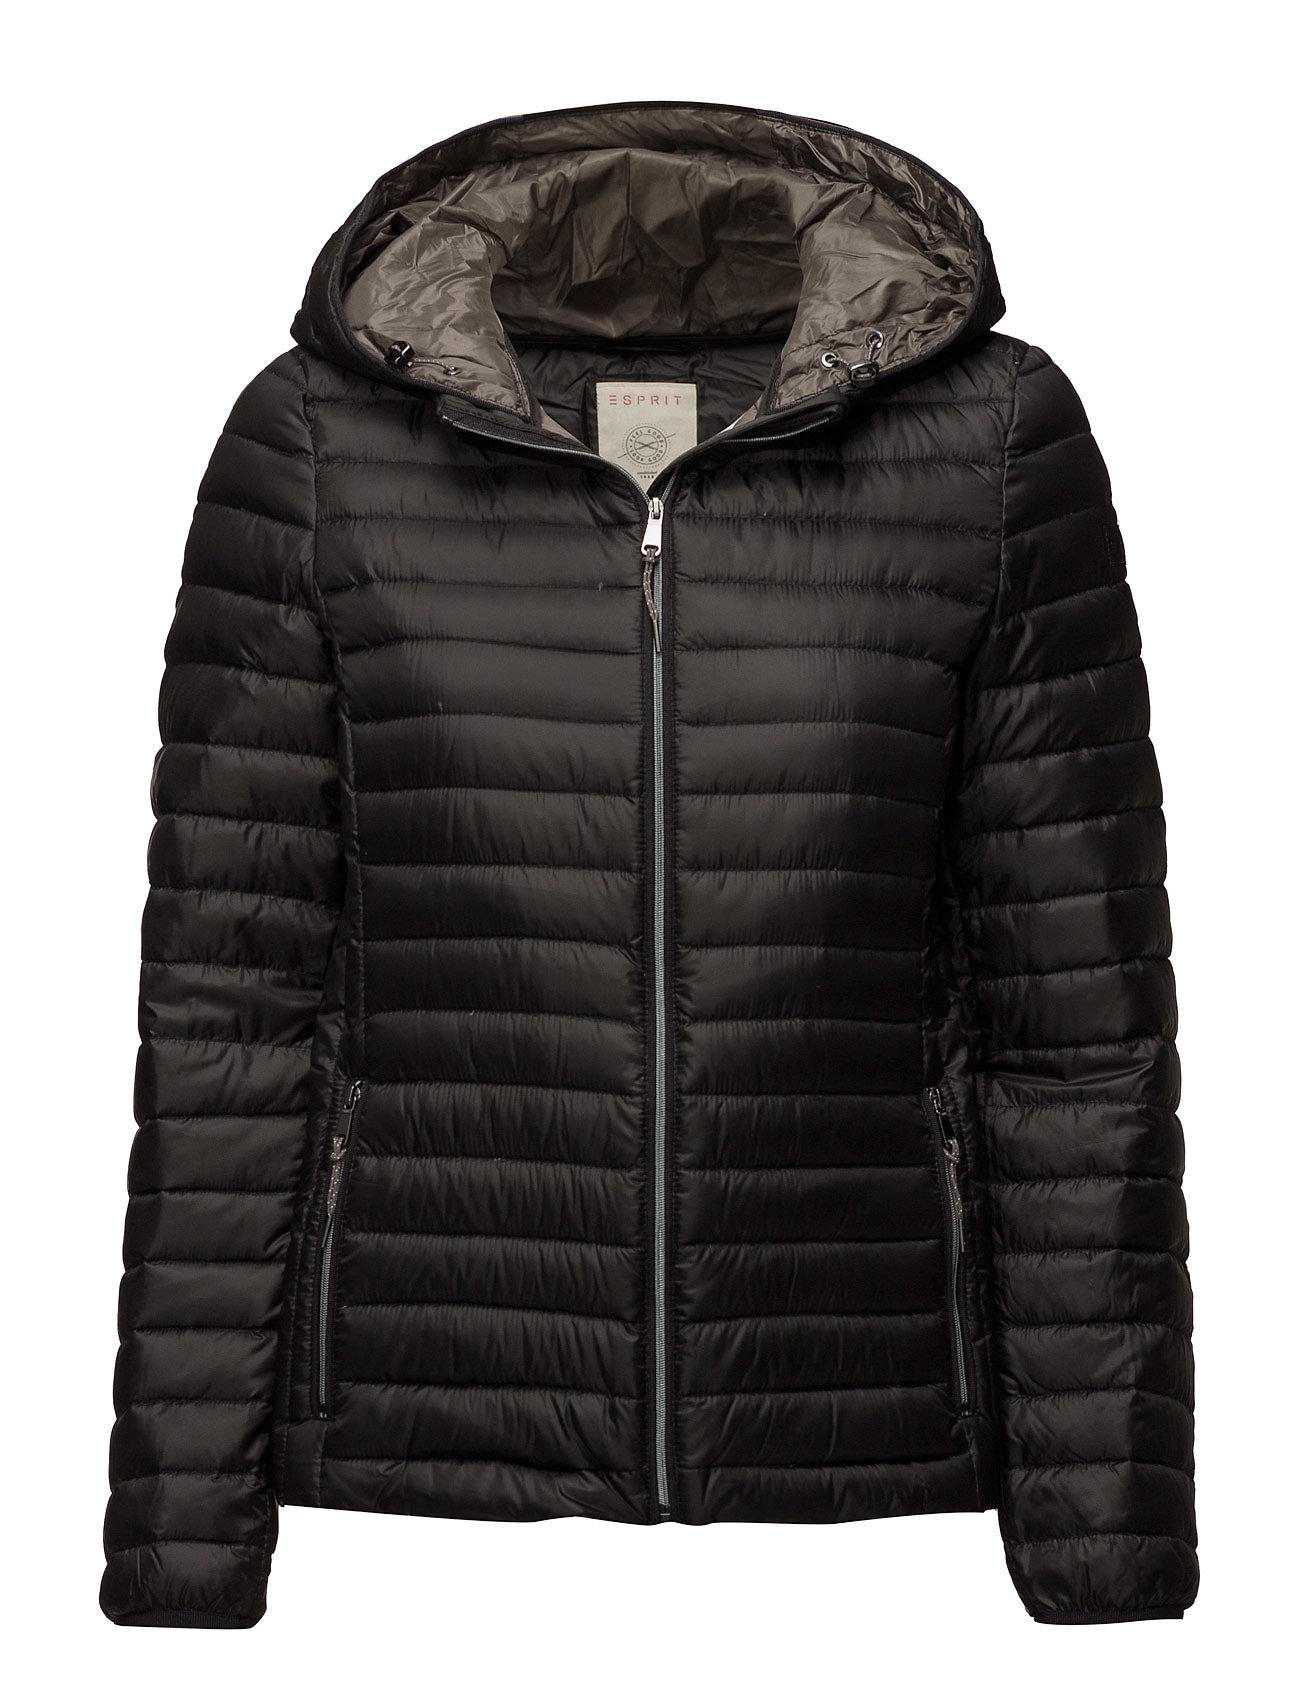 96cc18235d3d Jackets Outdoor Woven Esprit Casual Jakker til Kvinder i